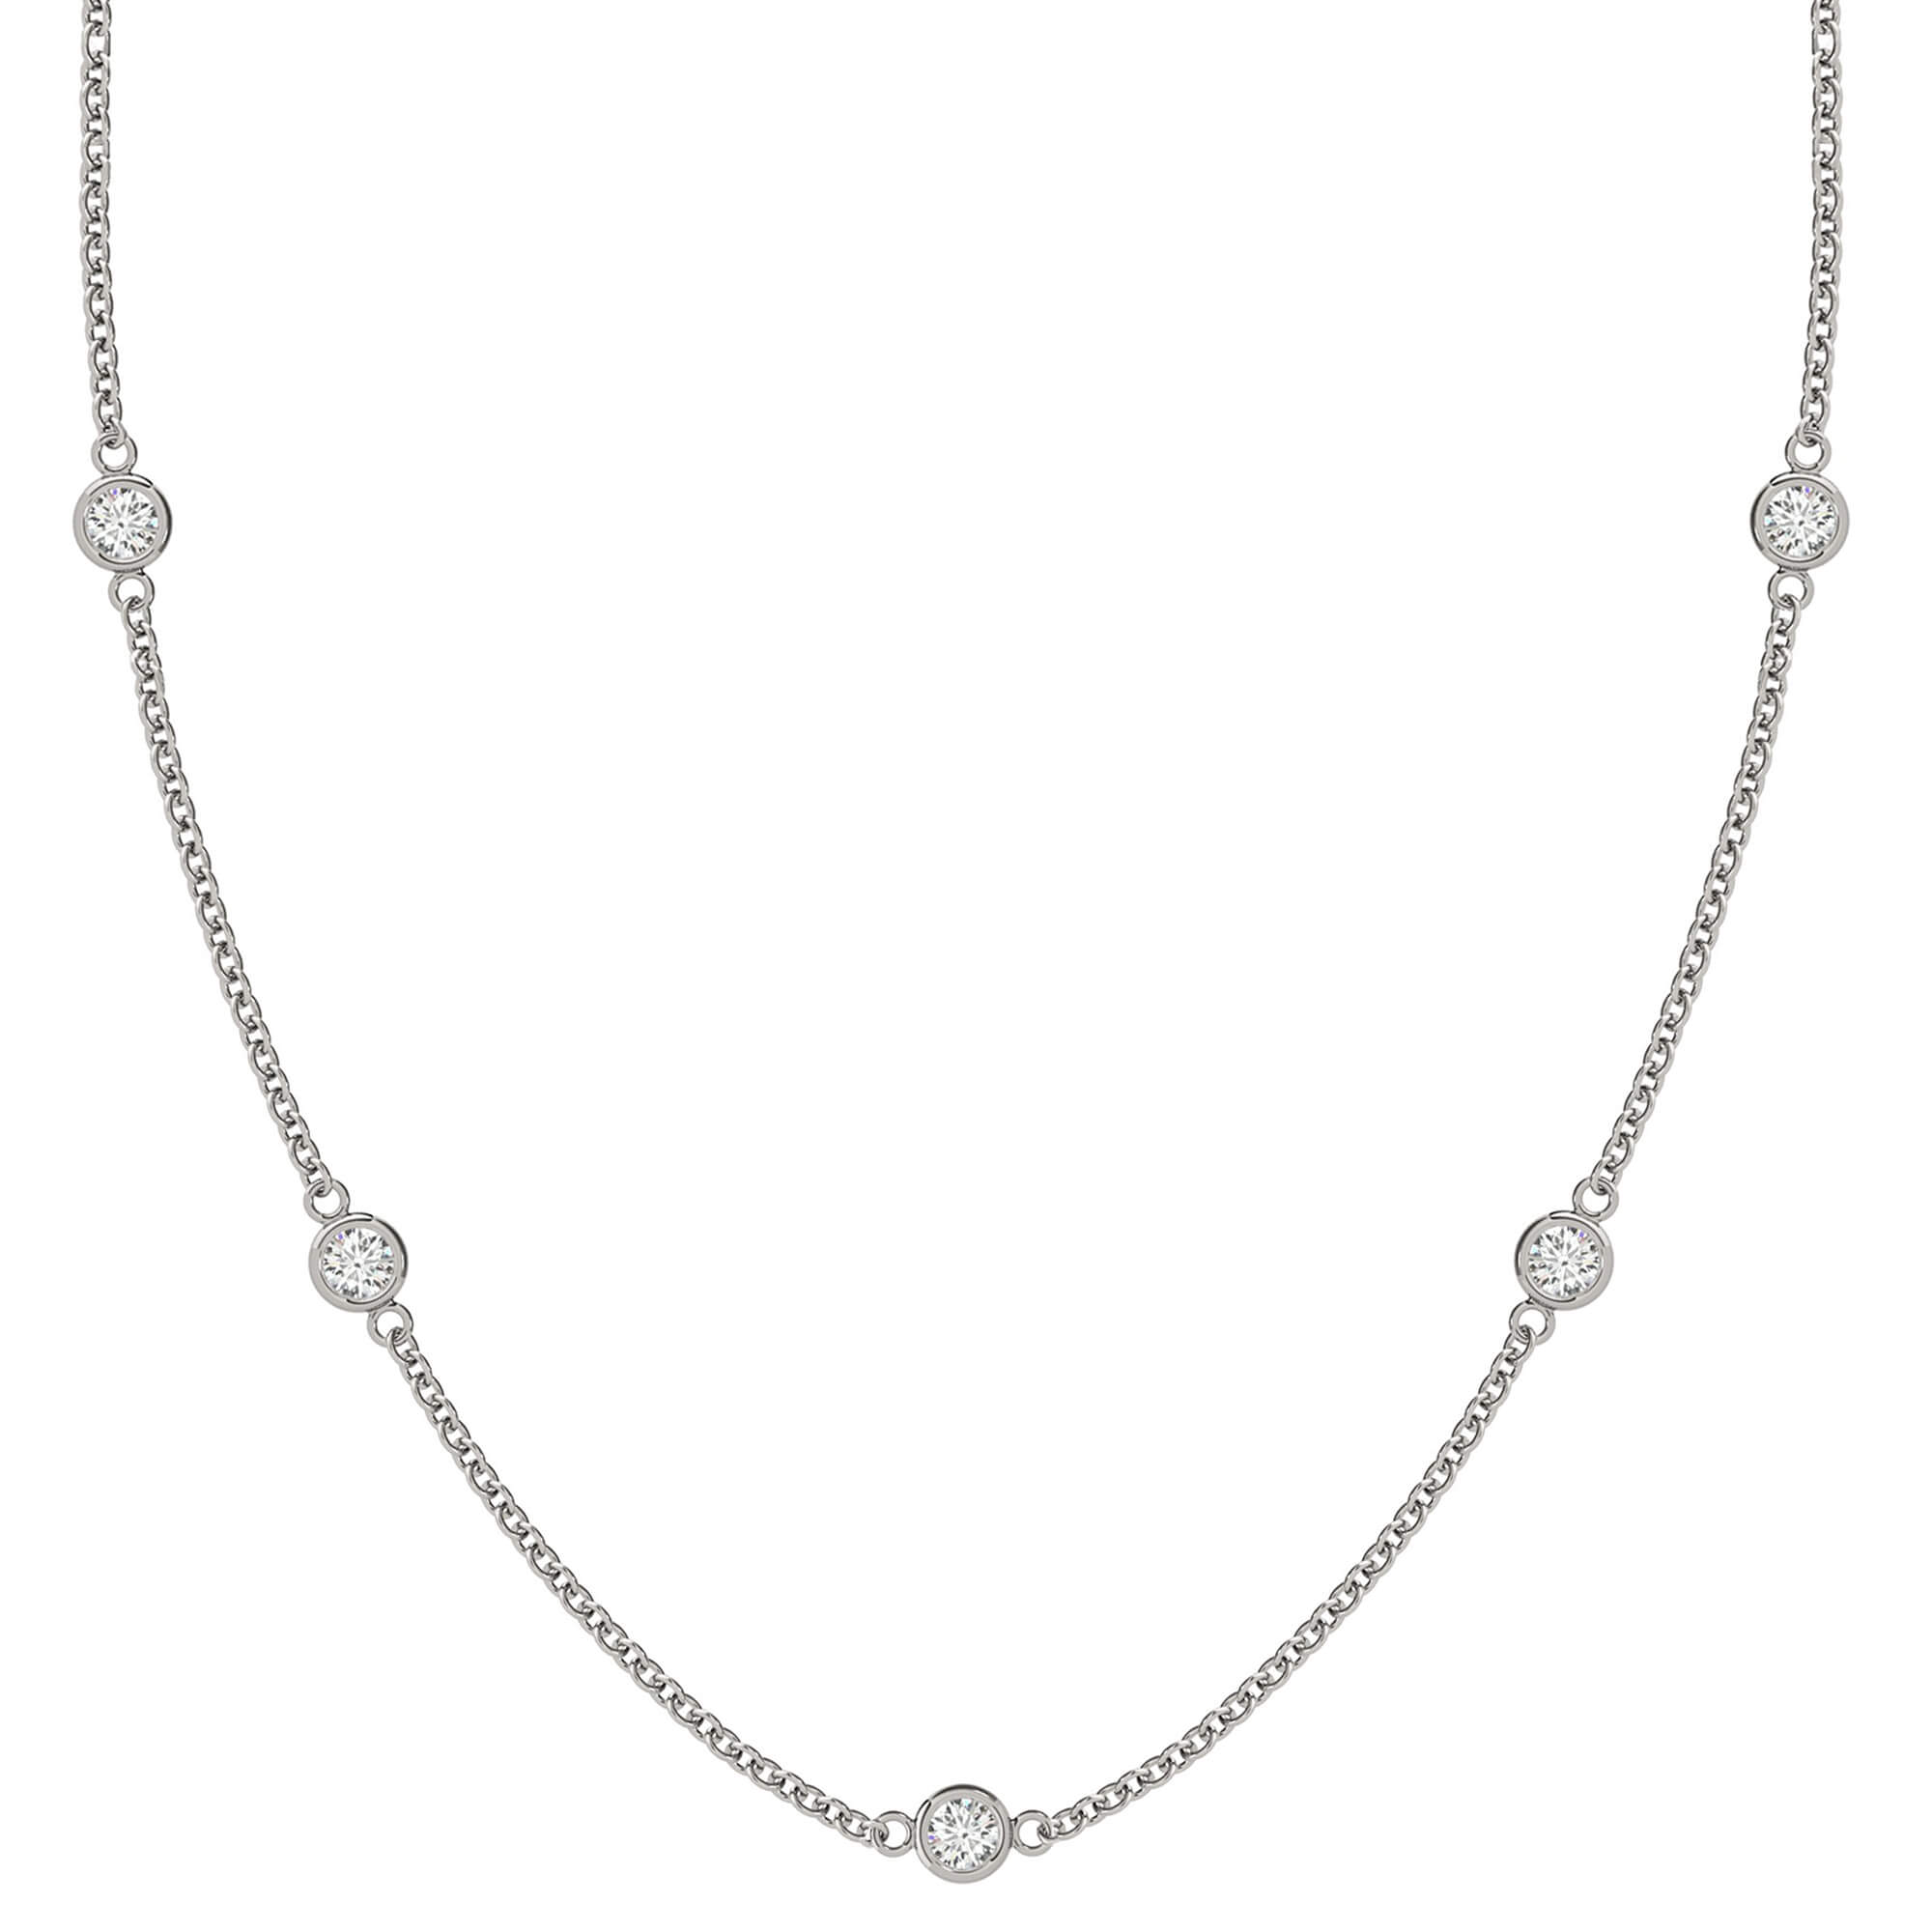 9ed86ab3c676d1 Buy Five Bezel-Set Diamond Station Necklace in 14K White Gold (0.5ctw)